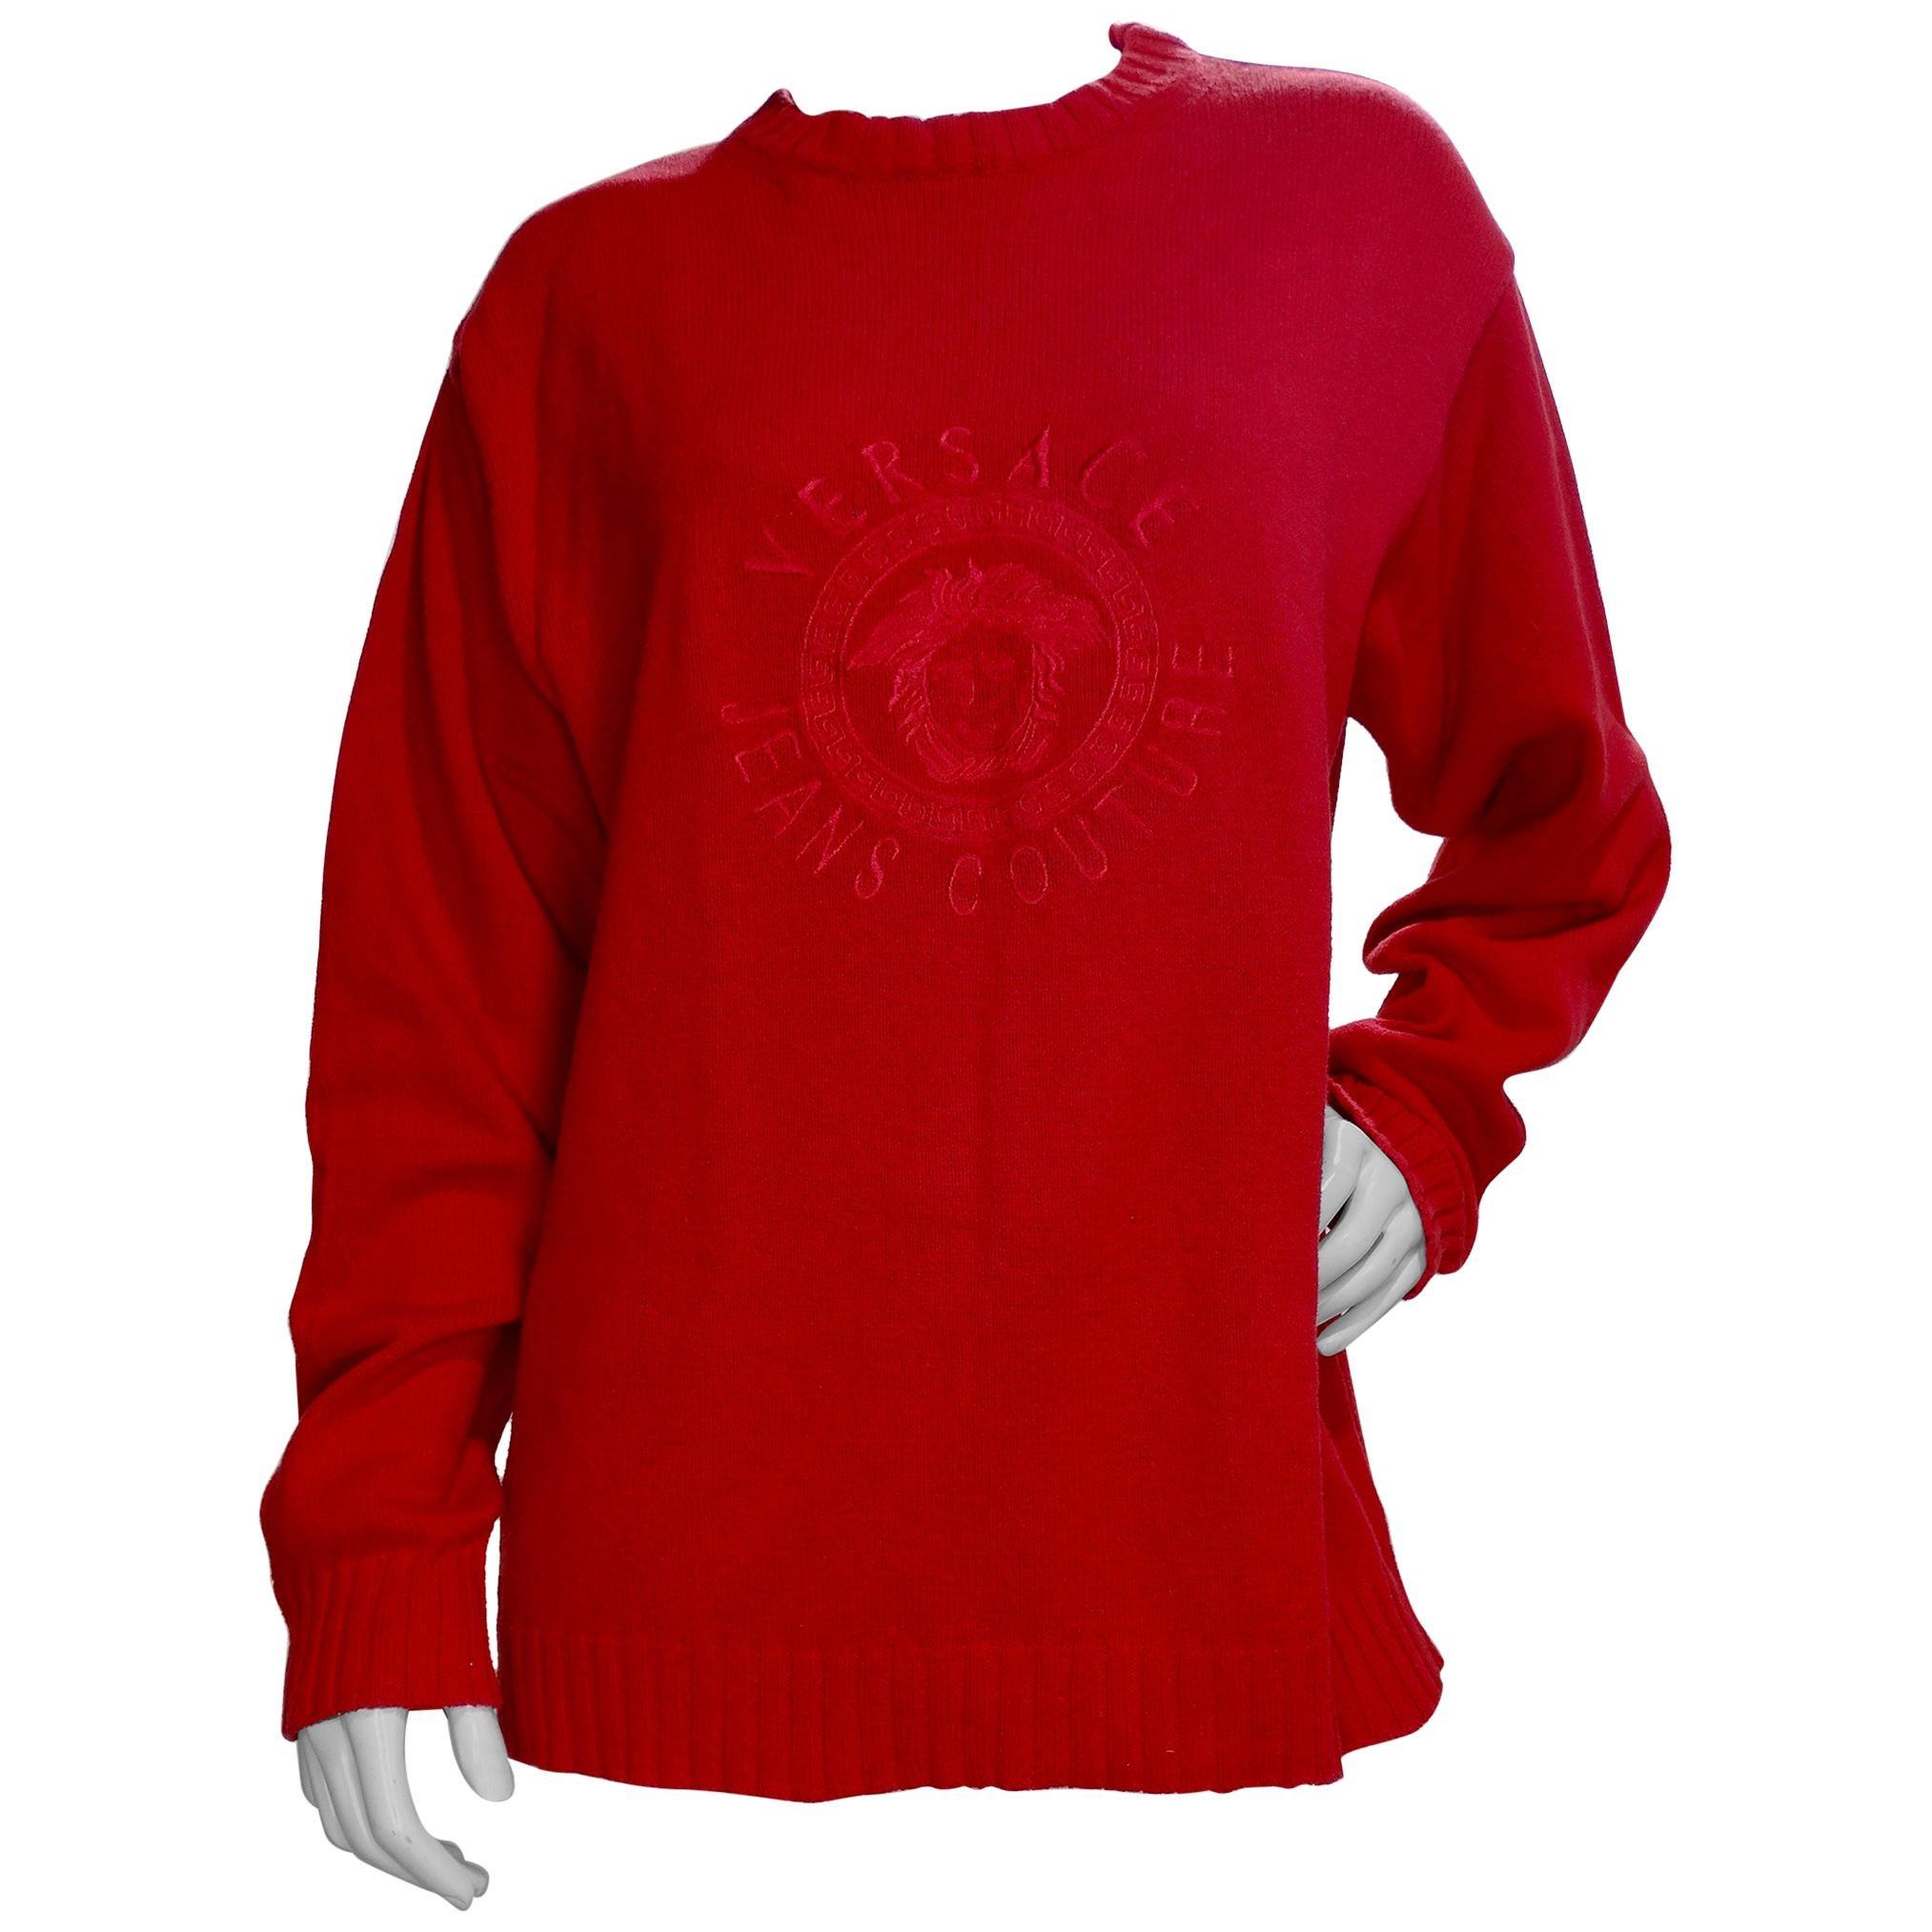 Gianni Versace 1990s Medusa Red Sweater